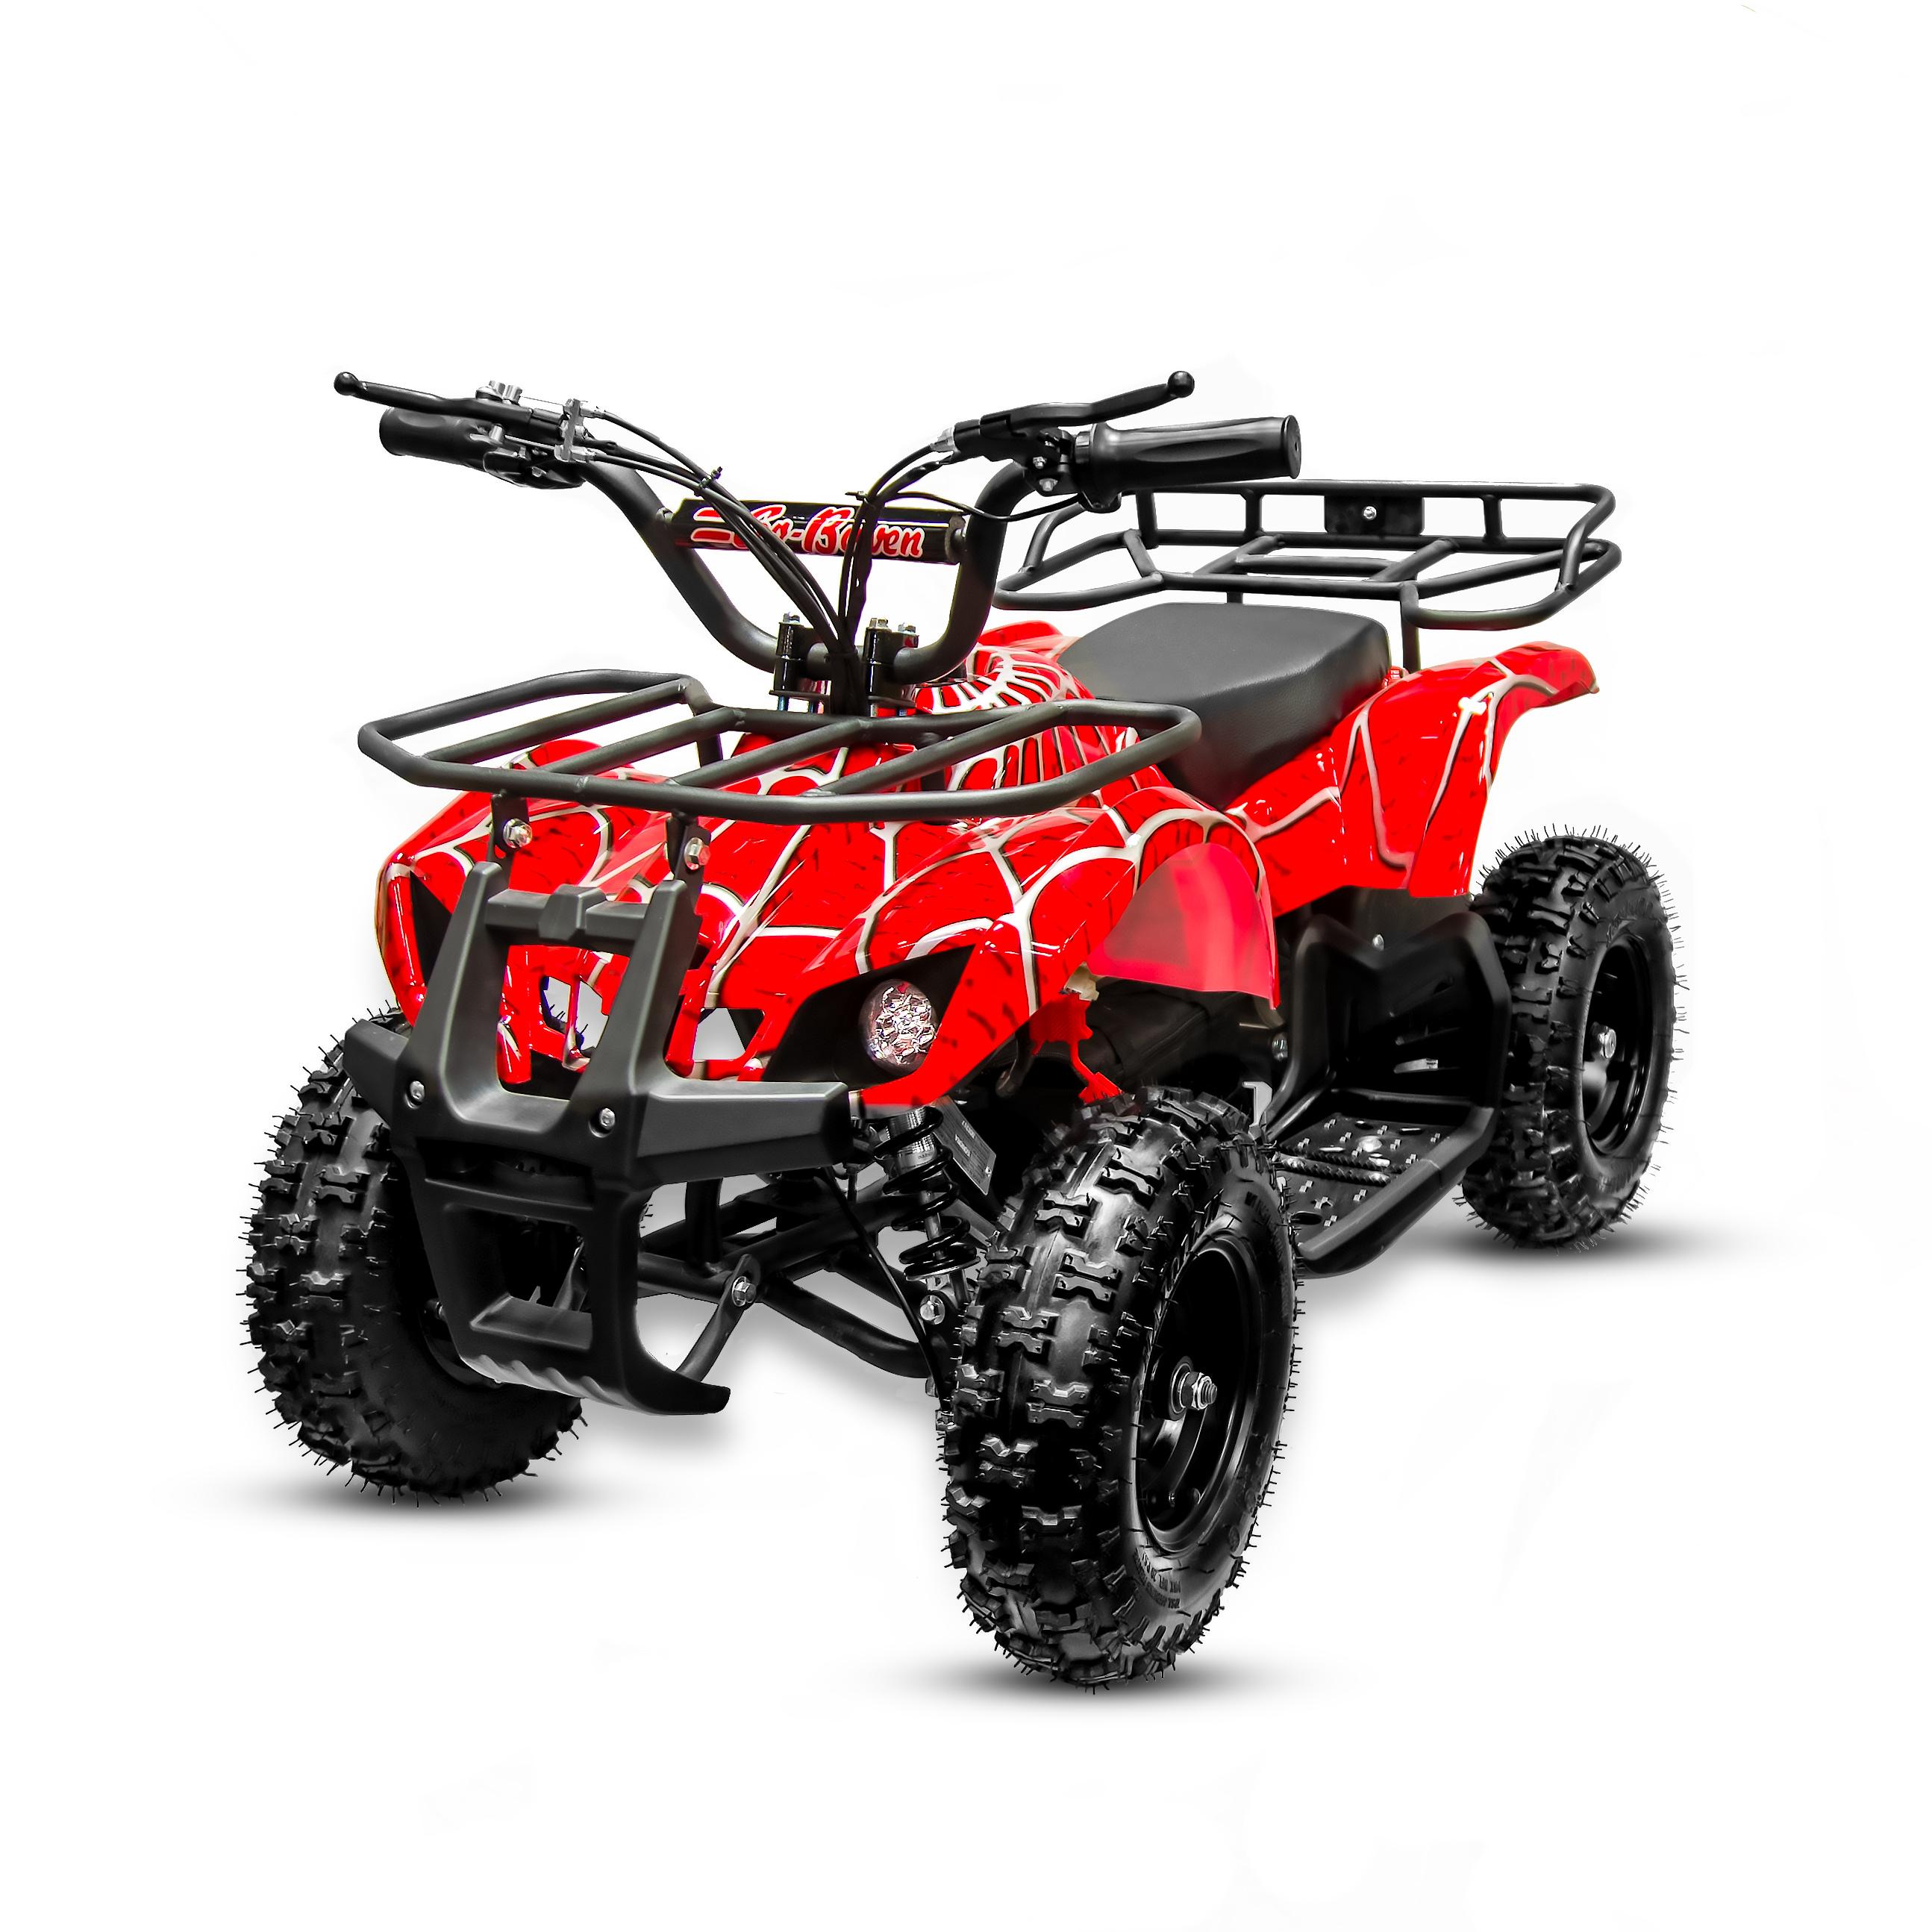 Electric Mini ATV Sonora on 350W 24V ( red spider)